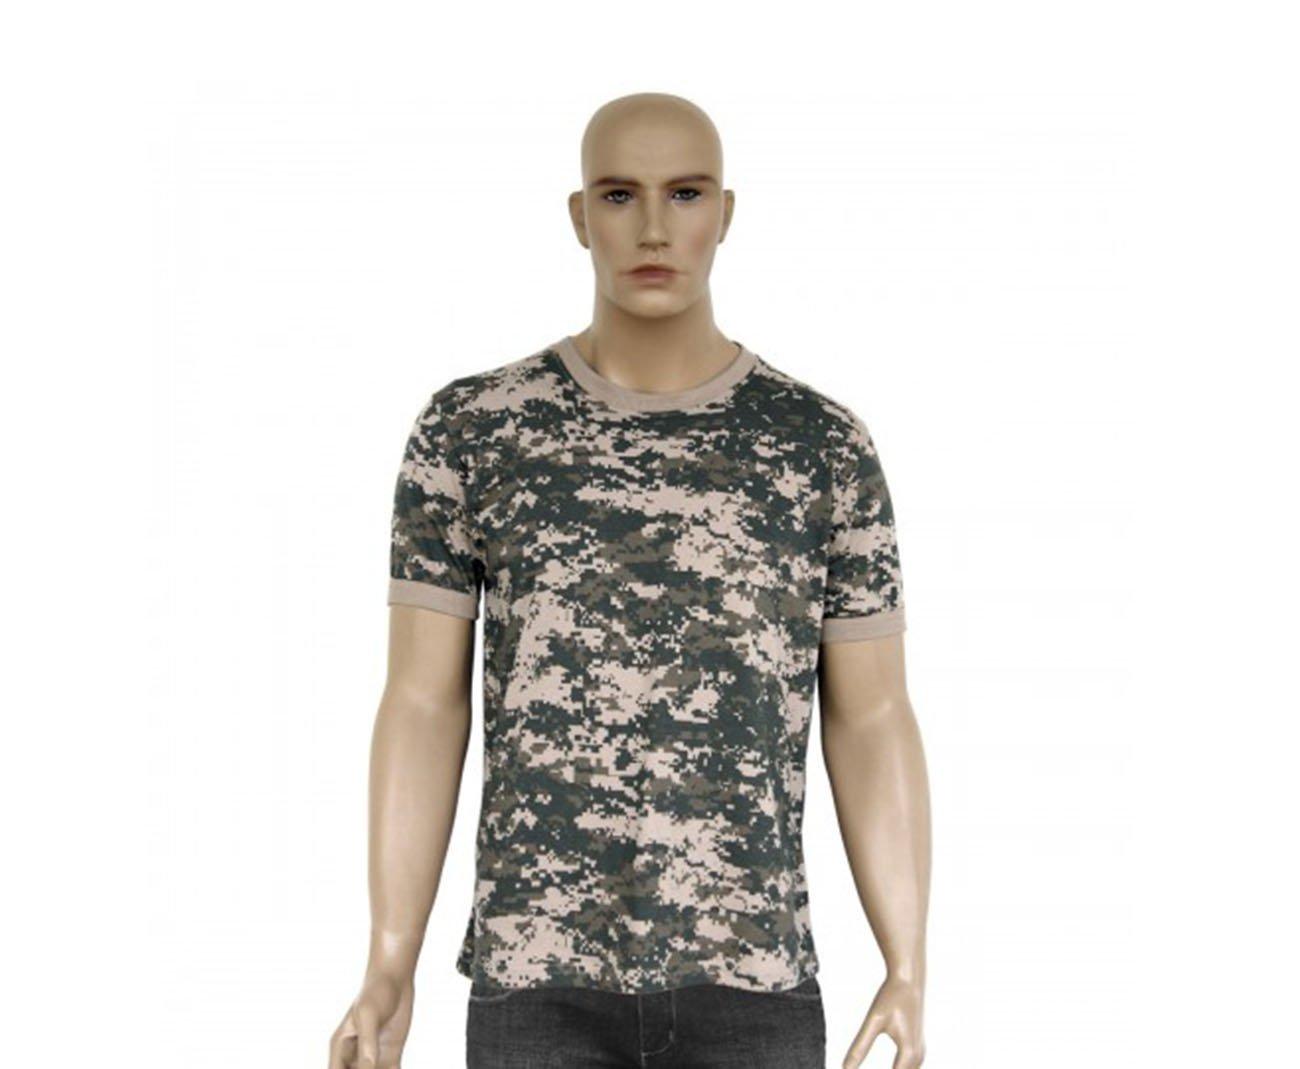 Camiseta Camuflada Digital Army Combaty - Bravo